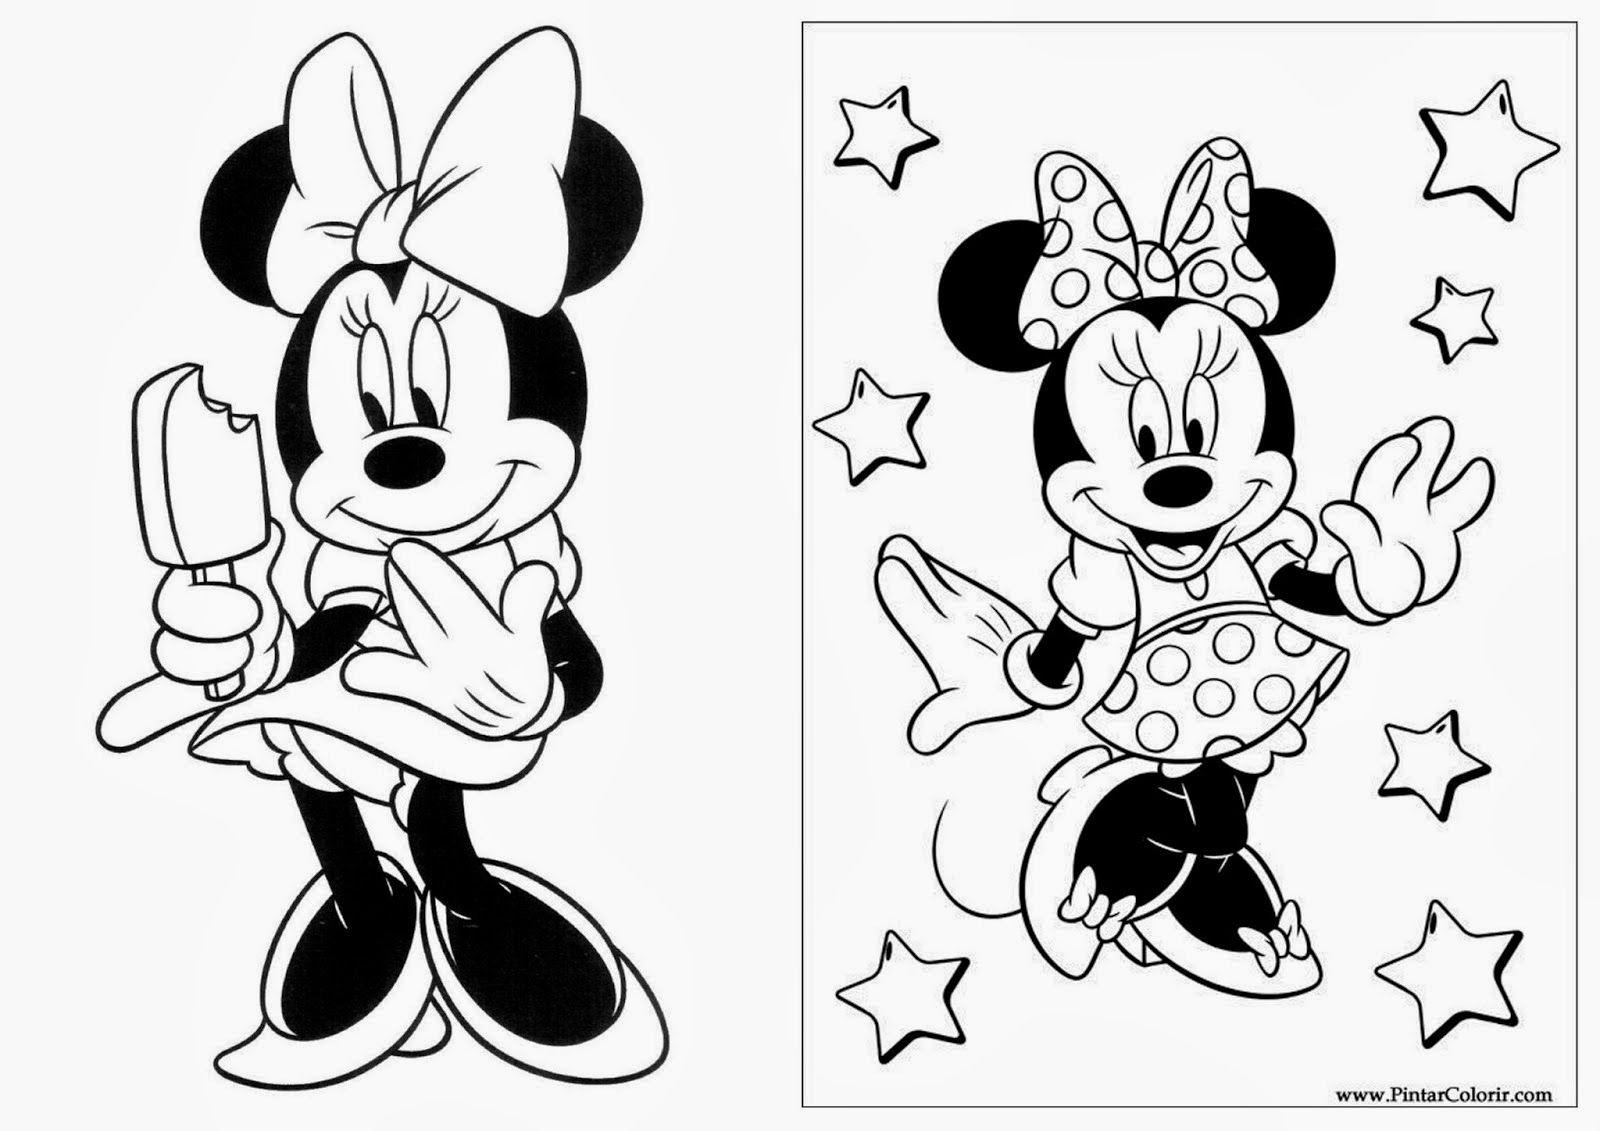 Minnie Libro Para Colorear Para Imprimir Gratis En 2020 Libros Para Colorear Bailarina Para Pintar Minnie